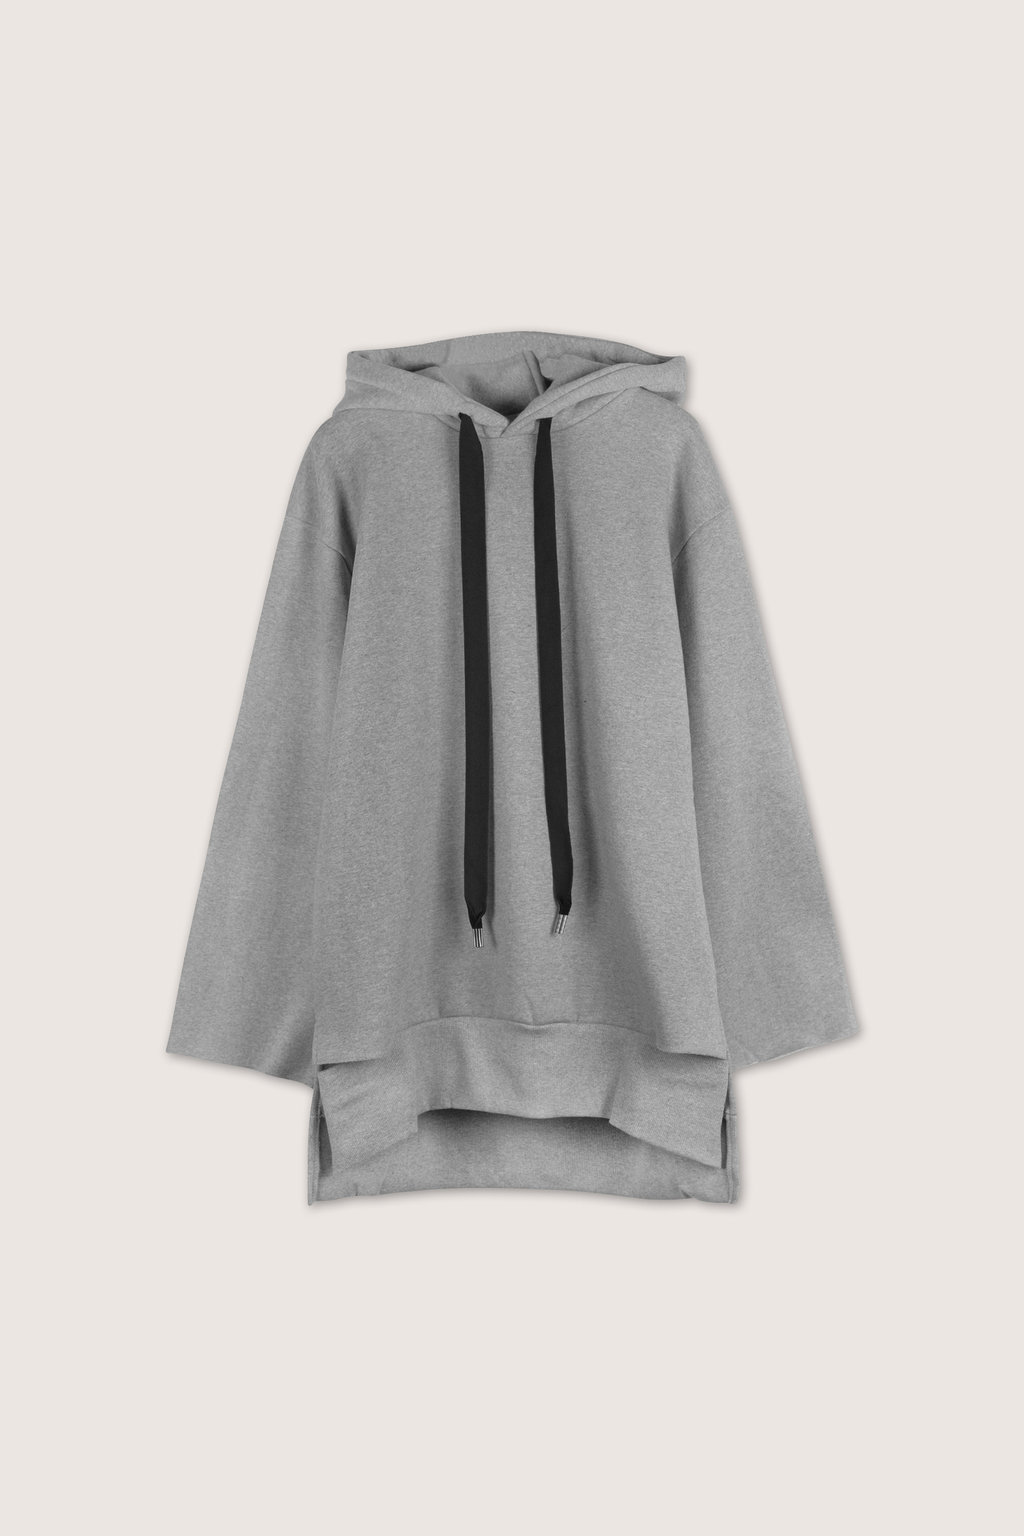 Hooded Tunic G013 Gray 12